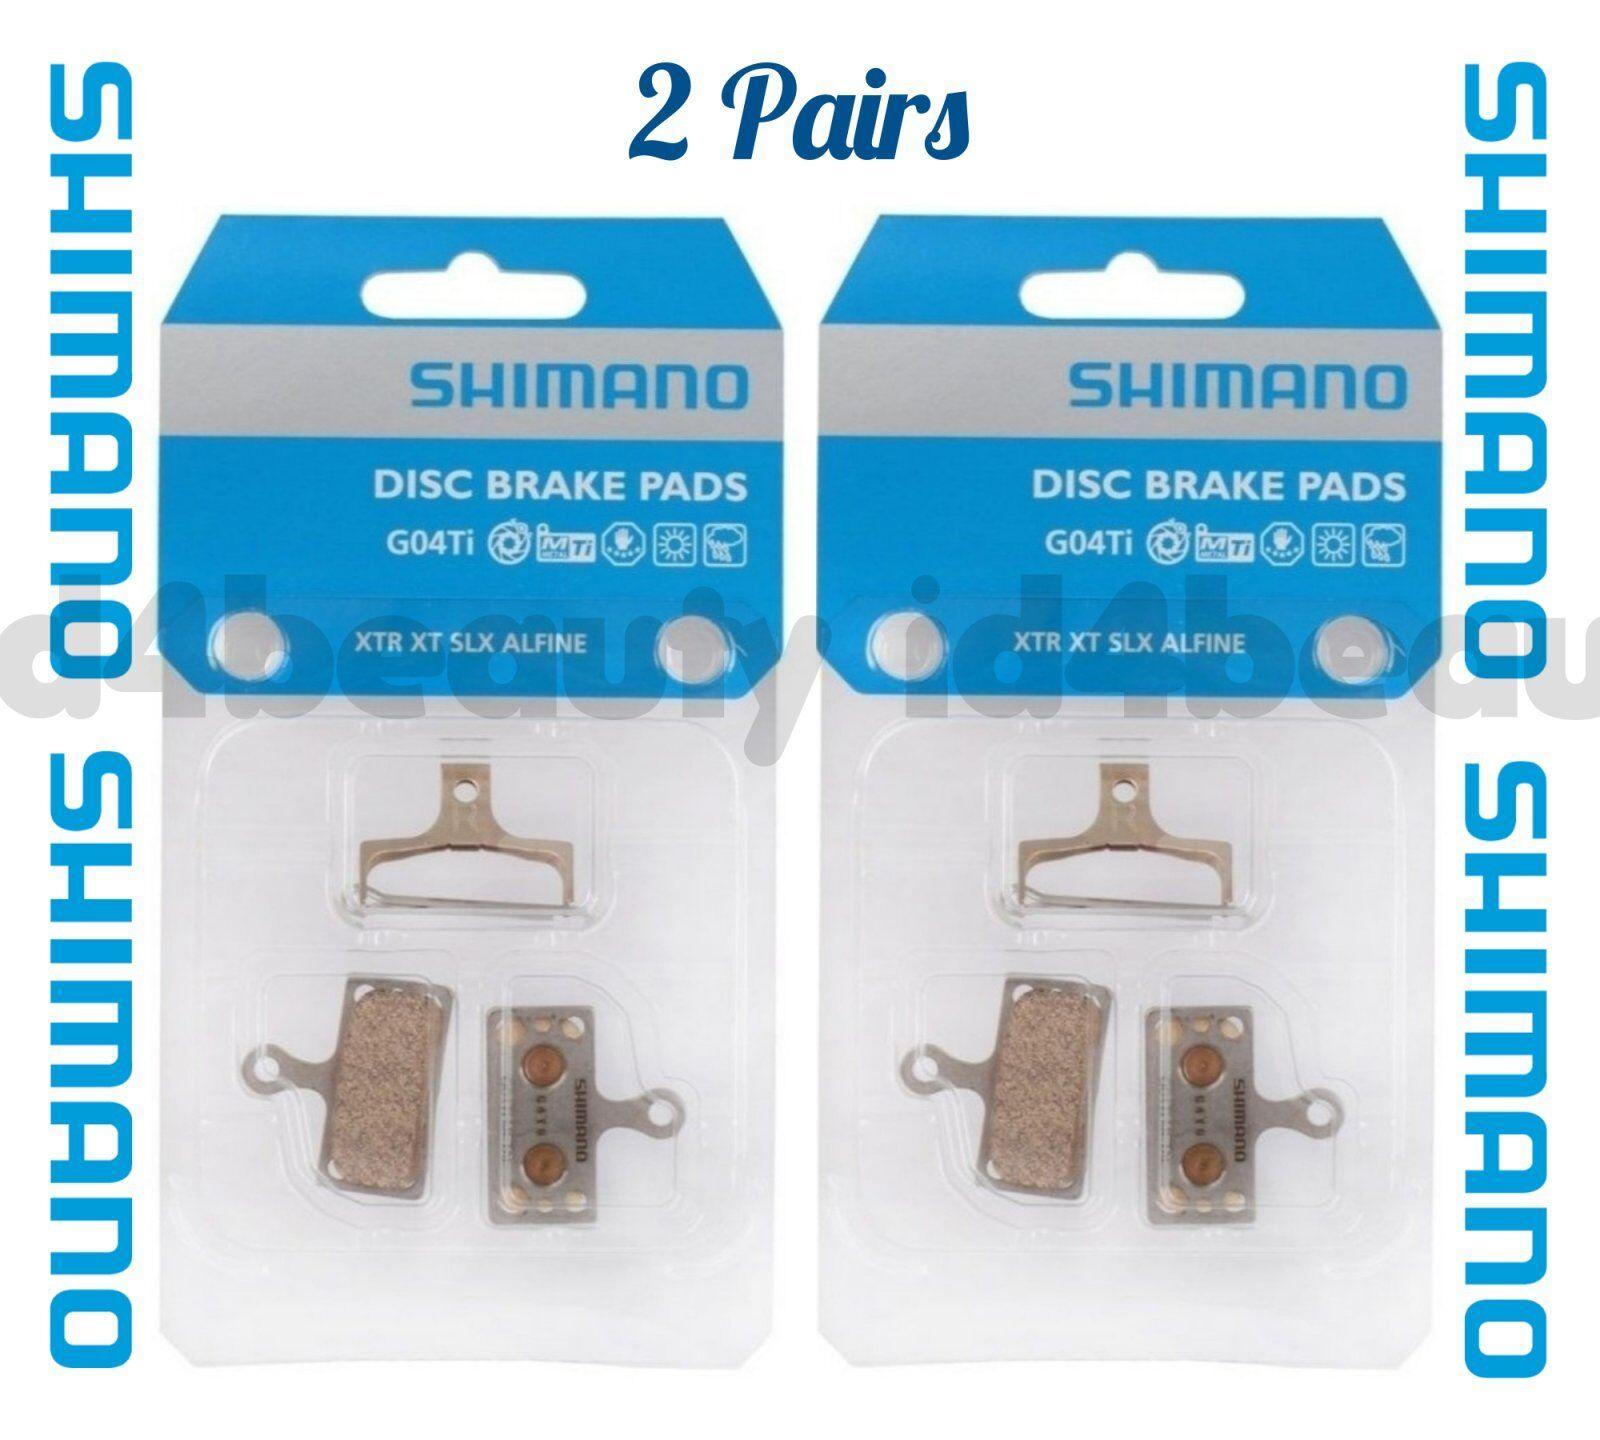 Shimano  G04Ti Metal Disc Brake Pad & Spring w Split Pin XTR BR-M9020 (2 Pairs)  100% authentic